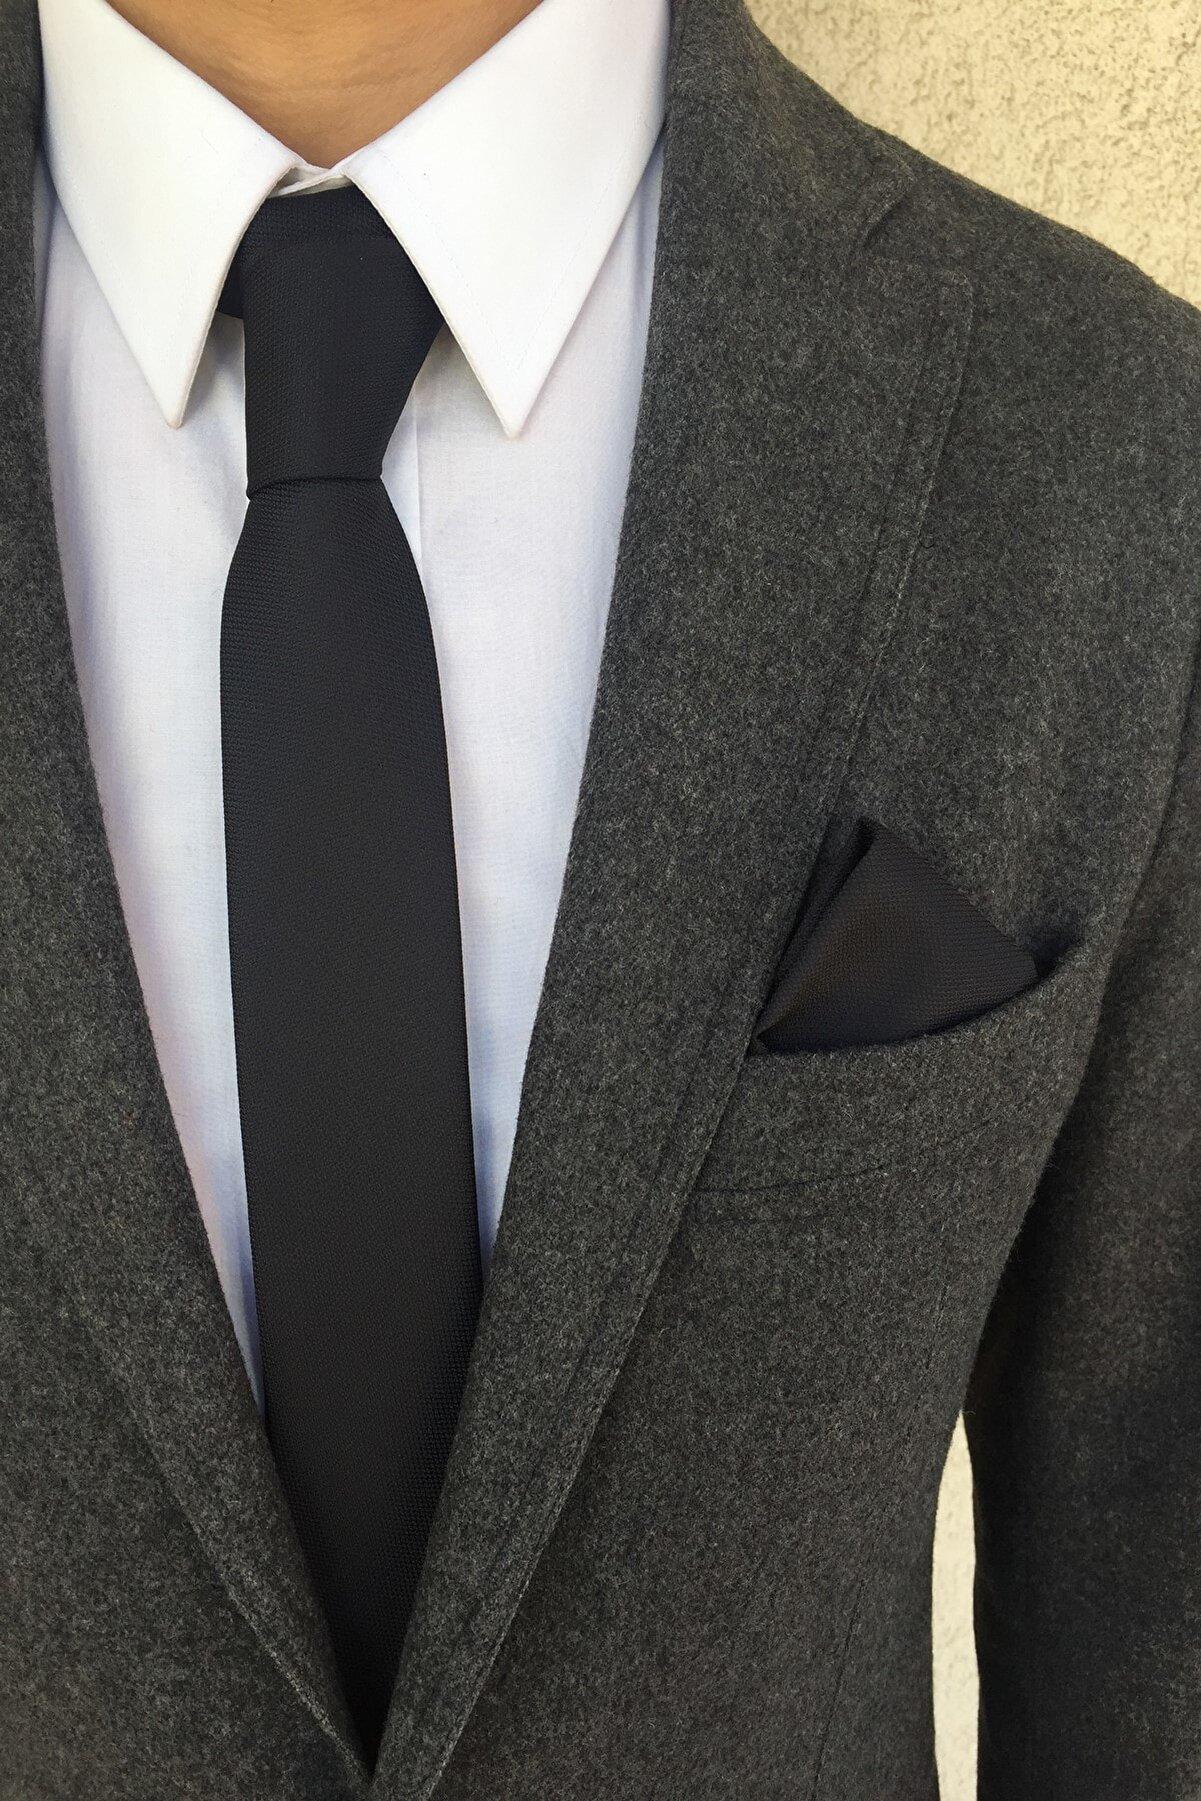 Kravatistan Siyah Kravat Mendil Seti